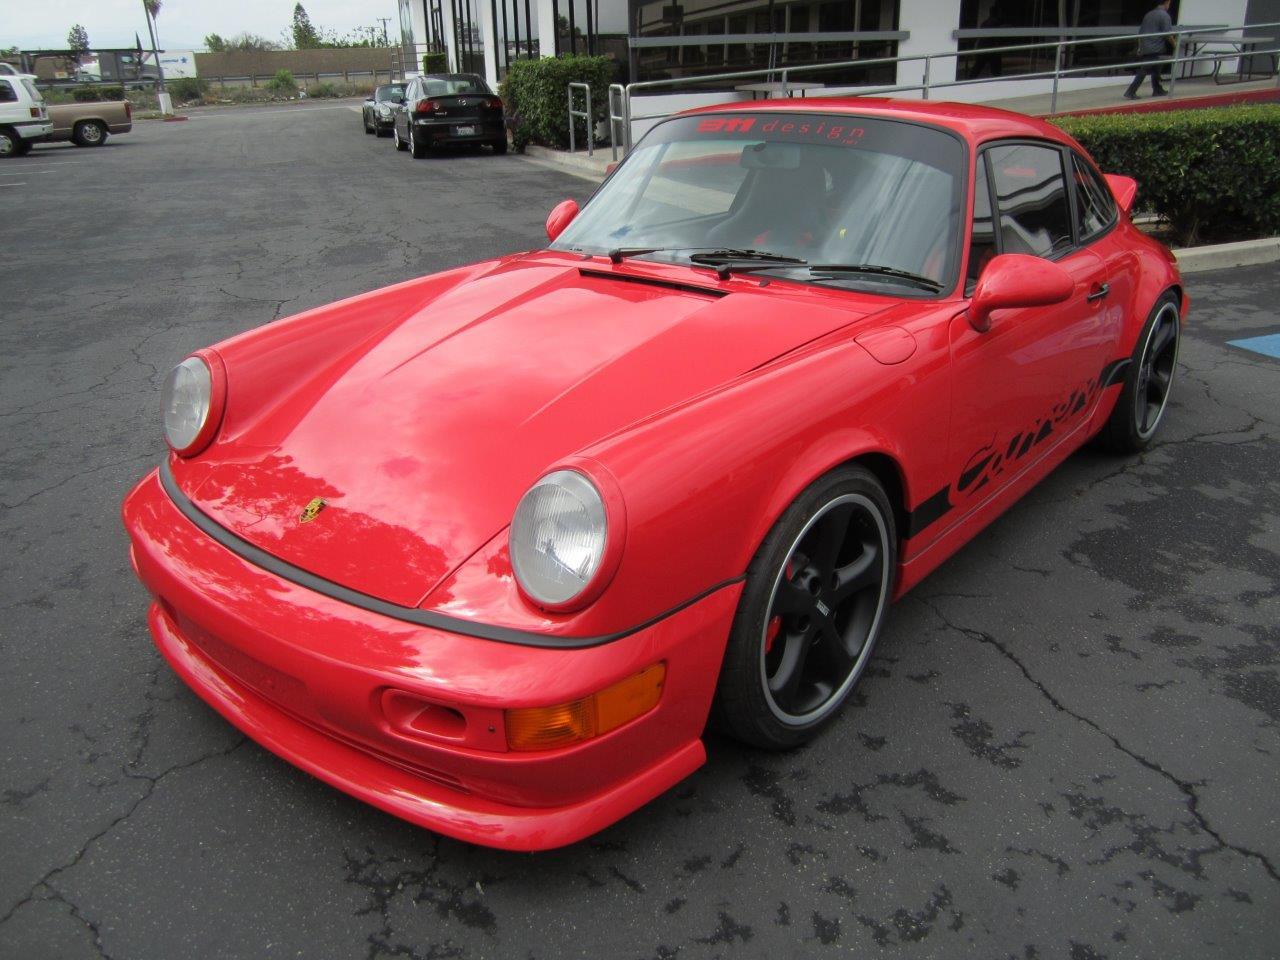 1989 Porsche 964 Carrera Overhaul 911 Design Porsche